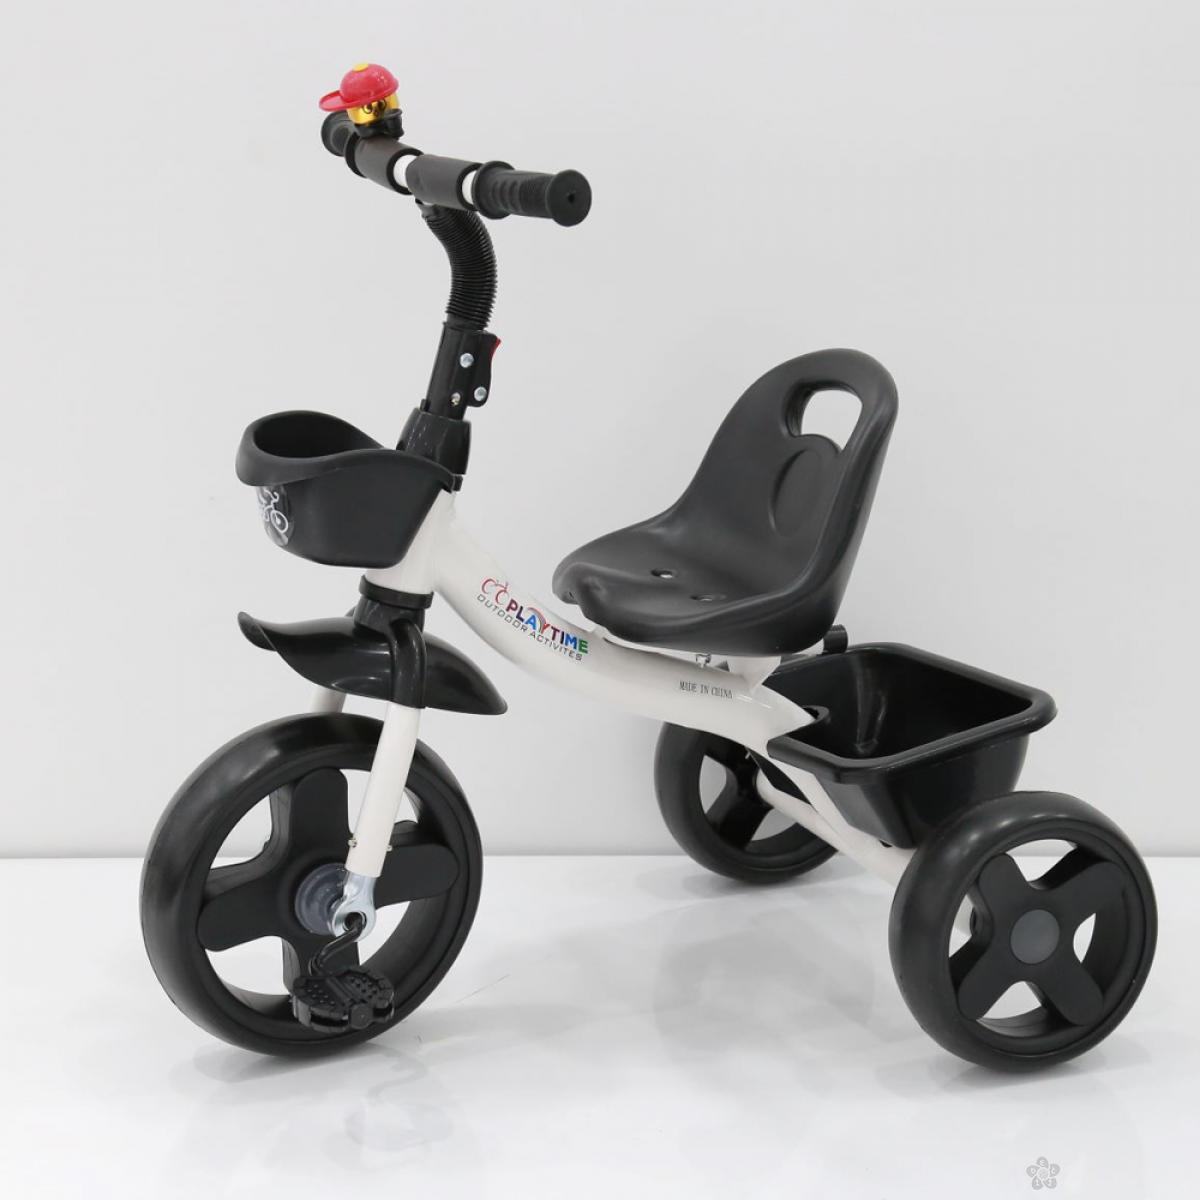 Tricikl Playtime Nani II model 426-2 belo/crni